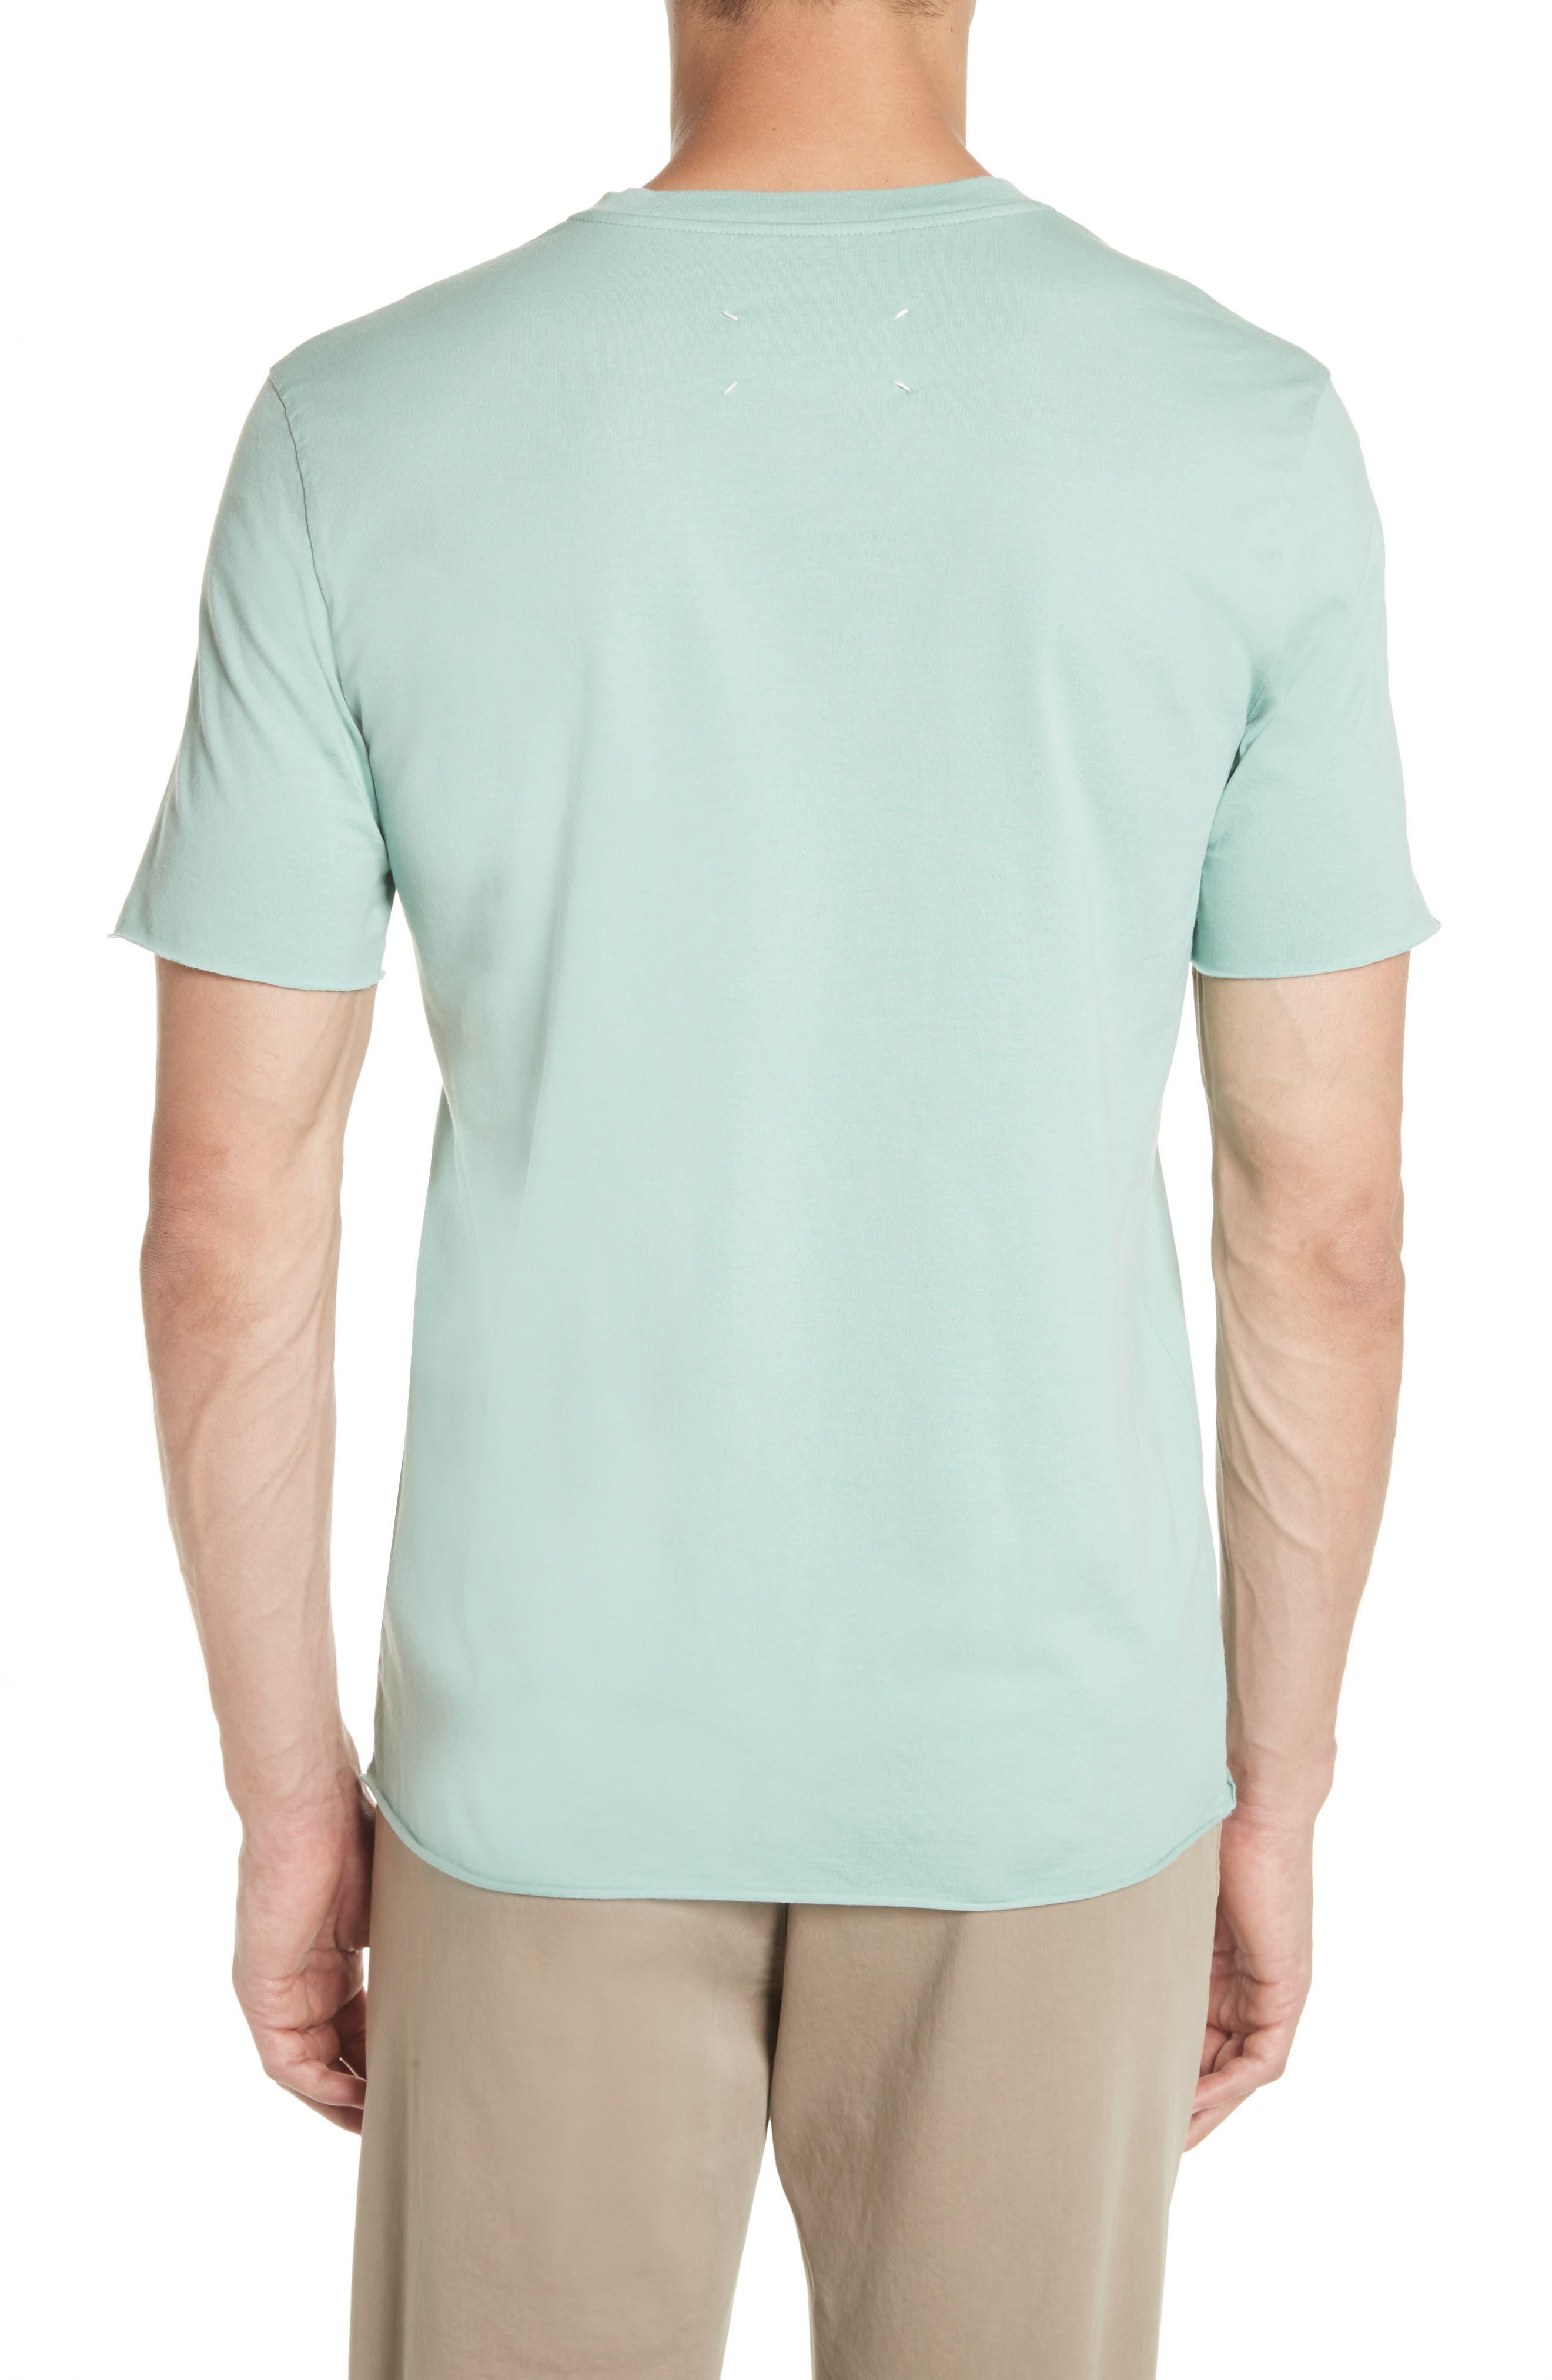 Missing Pocket T-Shirt,                             Alternate thumbnail 2, color,                             330